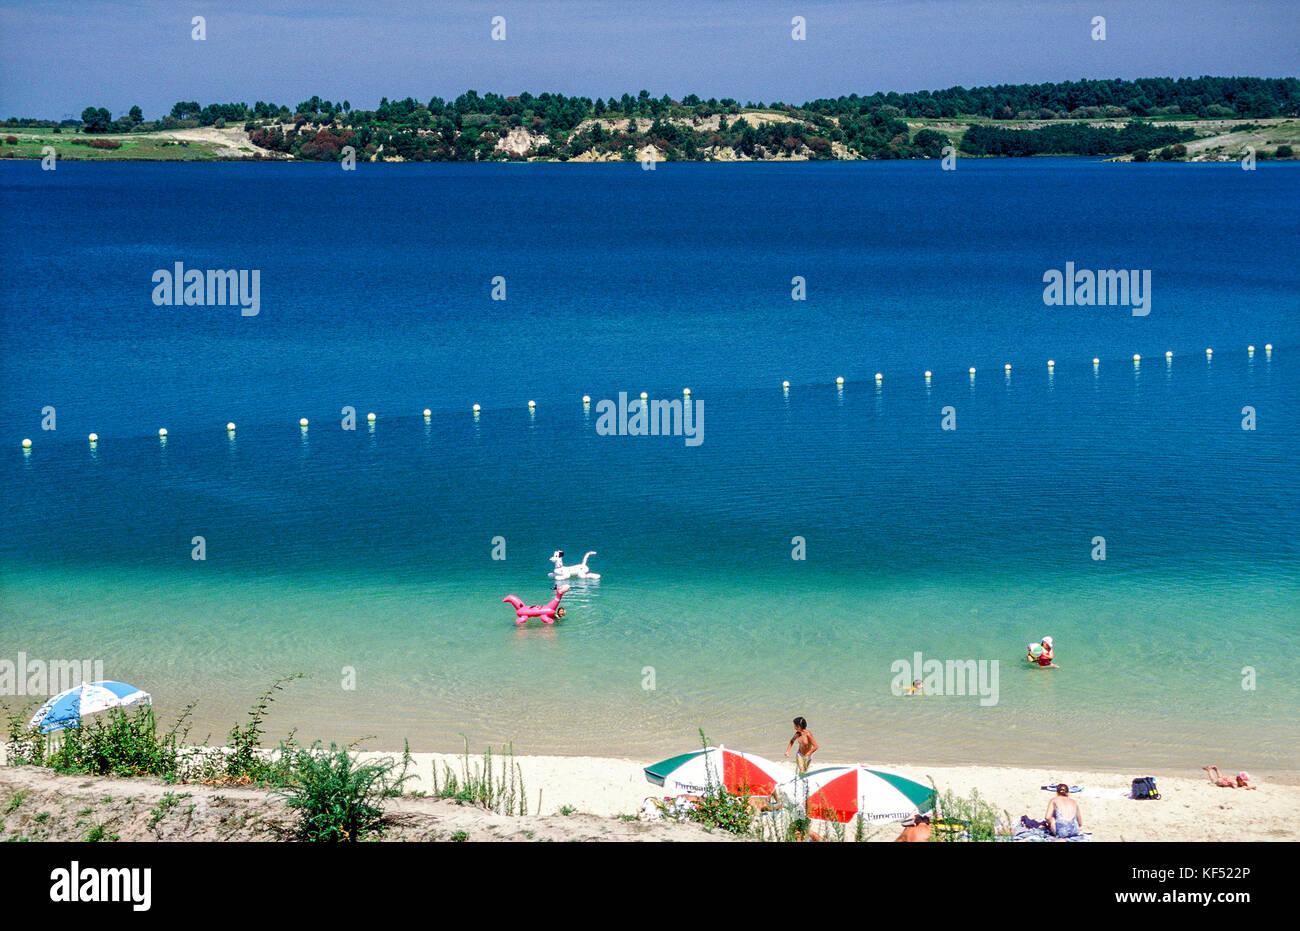 France, Landes, Arjuzanx, swimming lake on a former open brown coal